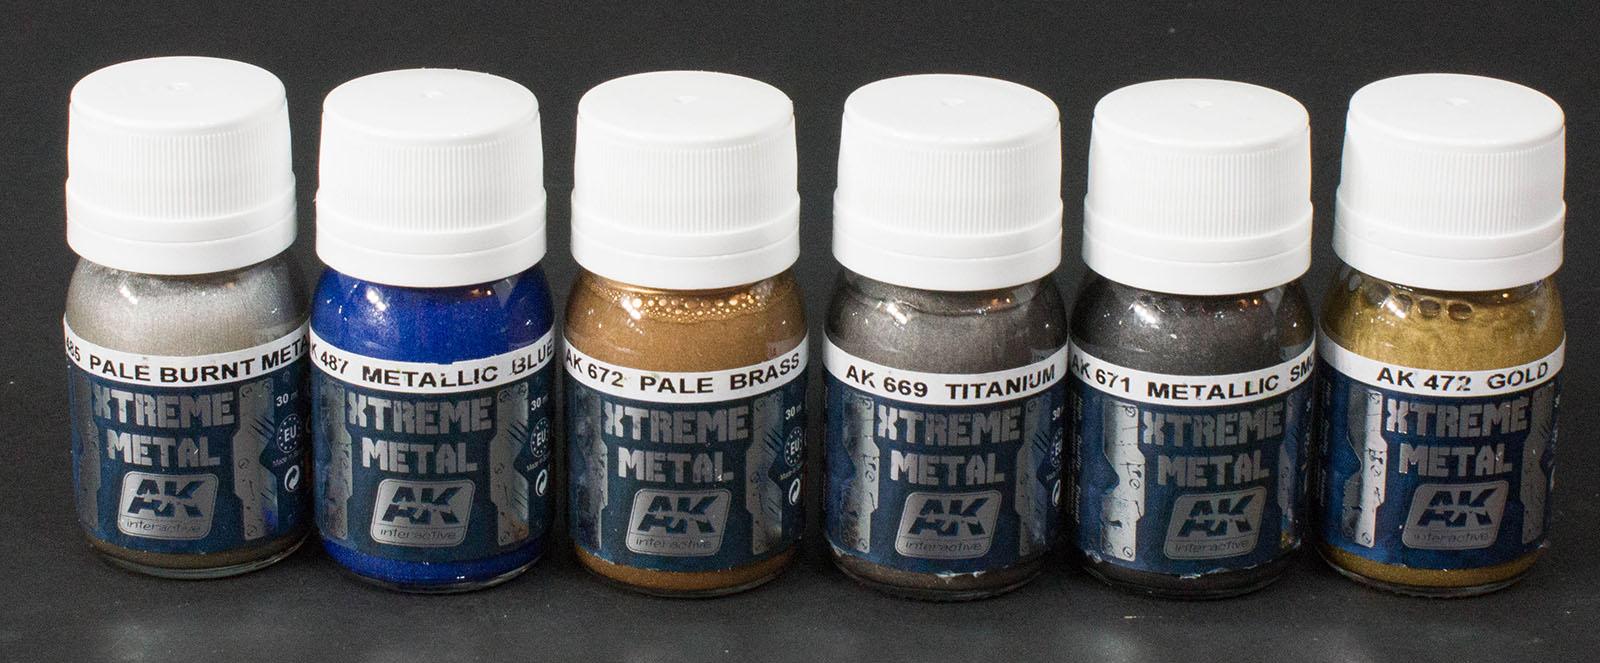 Interactive Xtreme Metal Colors Paint Review